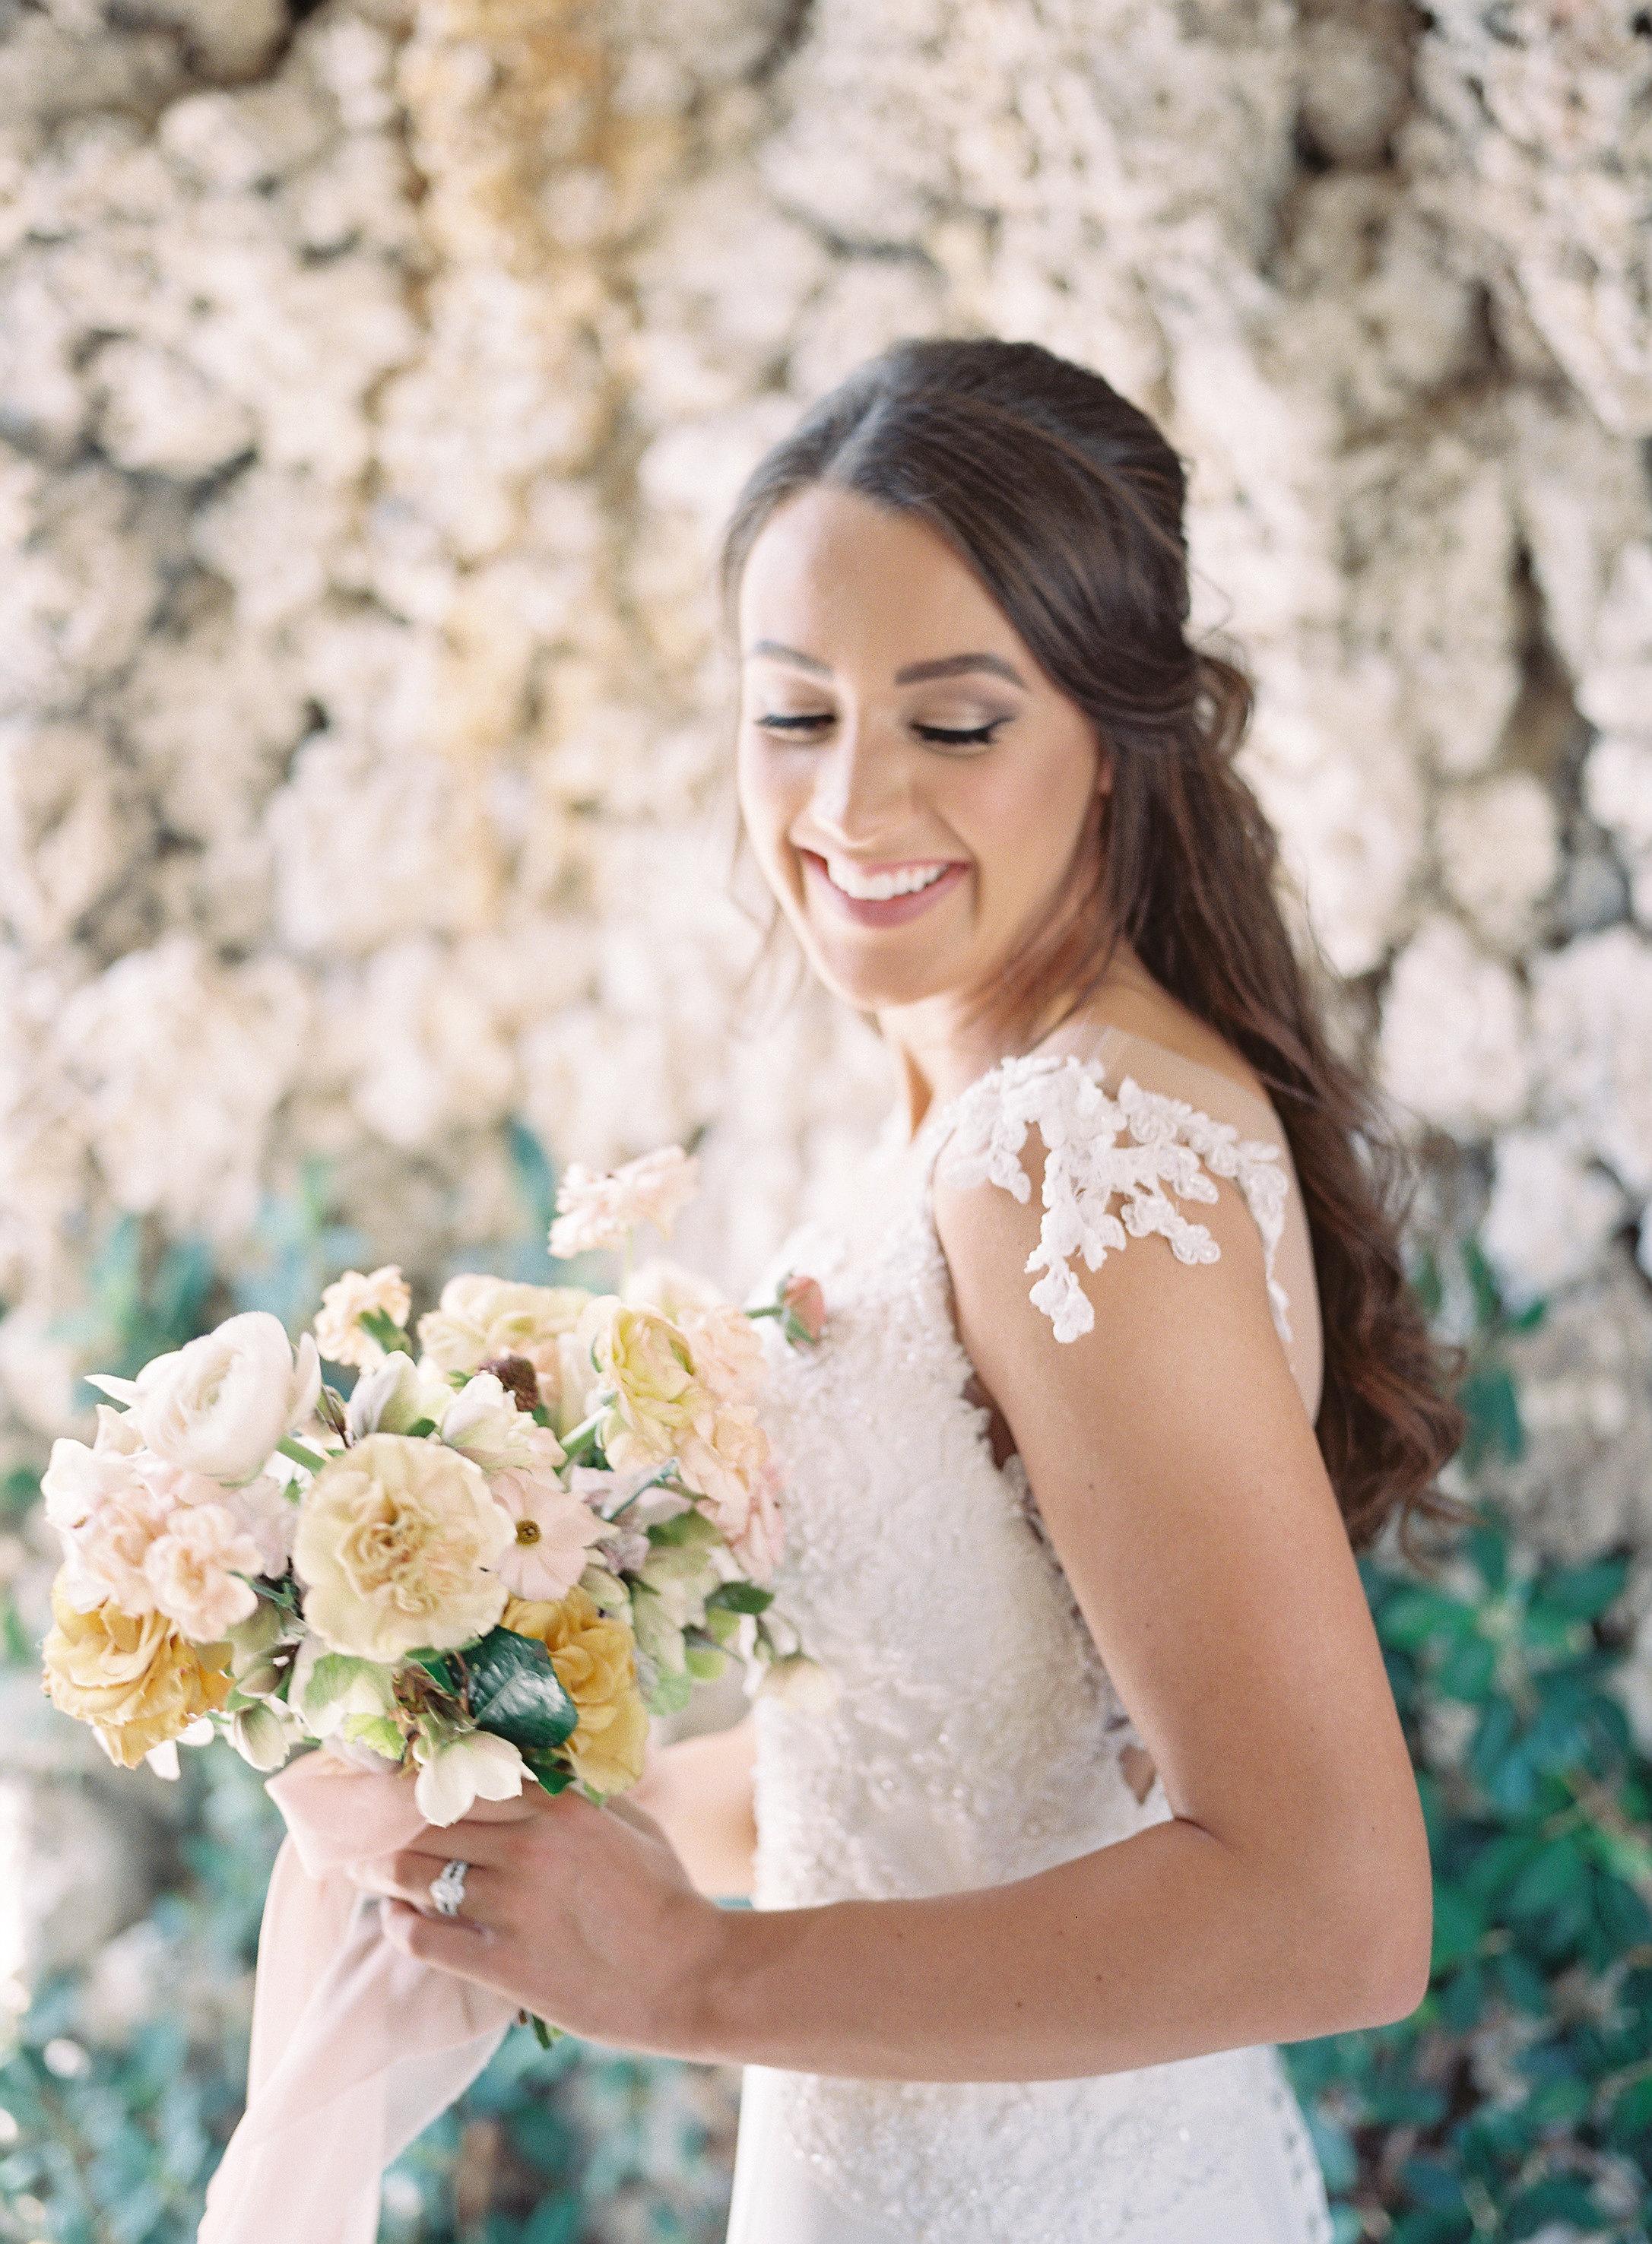 jessica-zimmerman-bridal-portraits-miami-bouquet.jpg